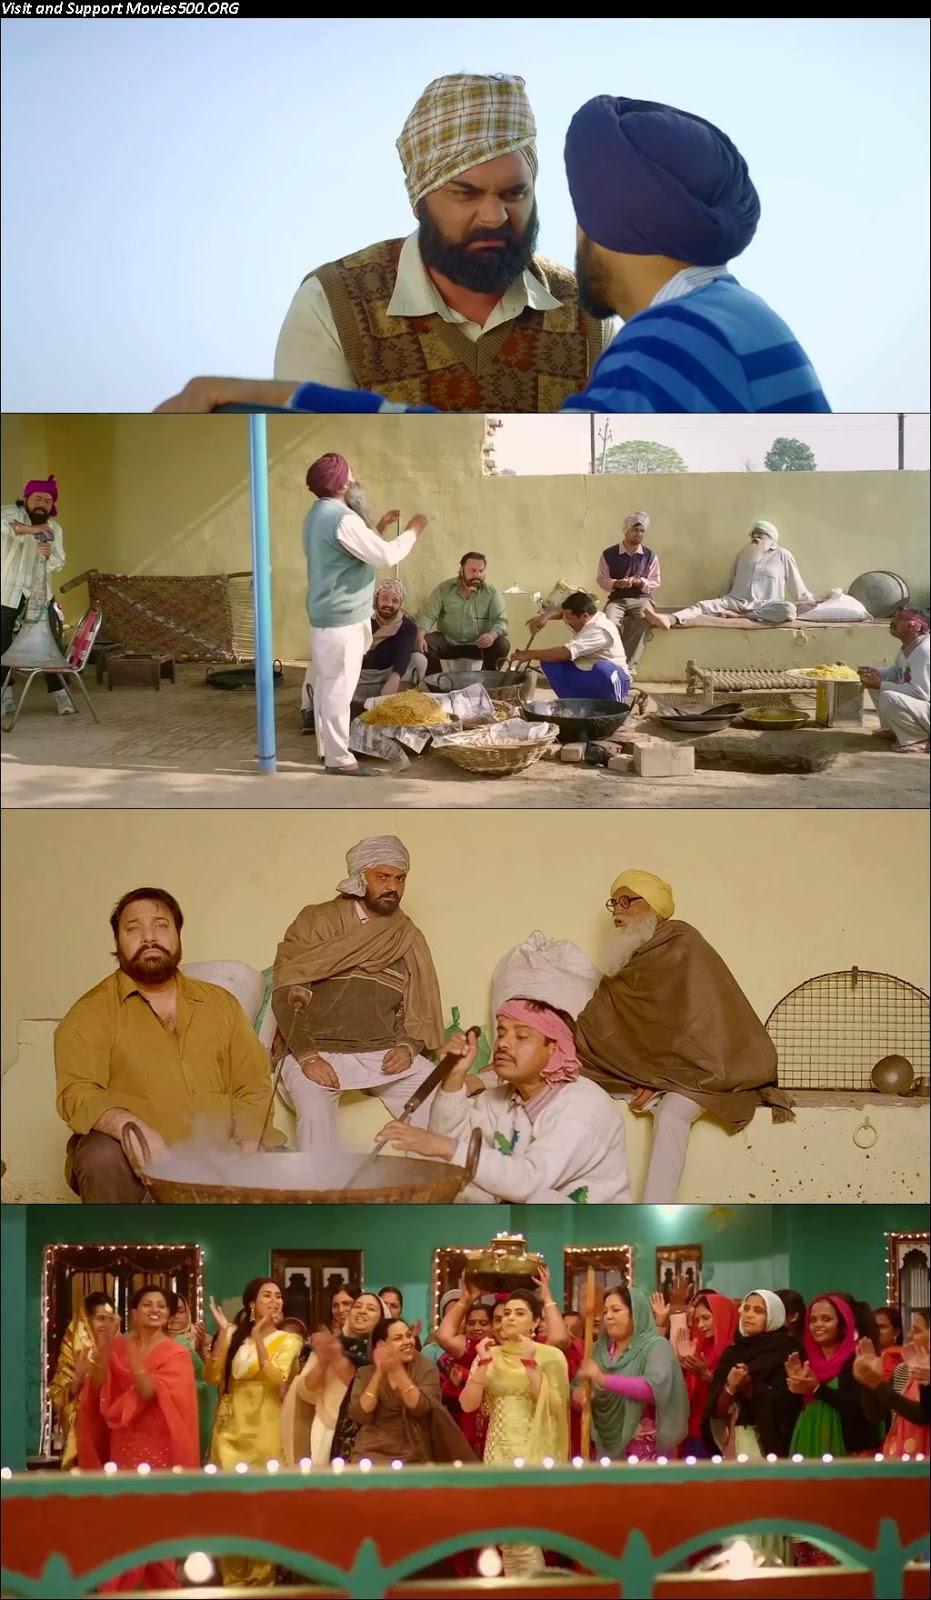 Manje Bistre 2017 Punjabi DVD HD Download WEBRip 720p at newbtcbank.com